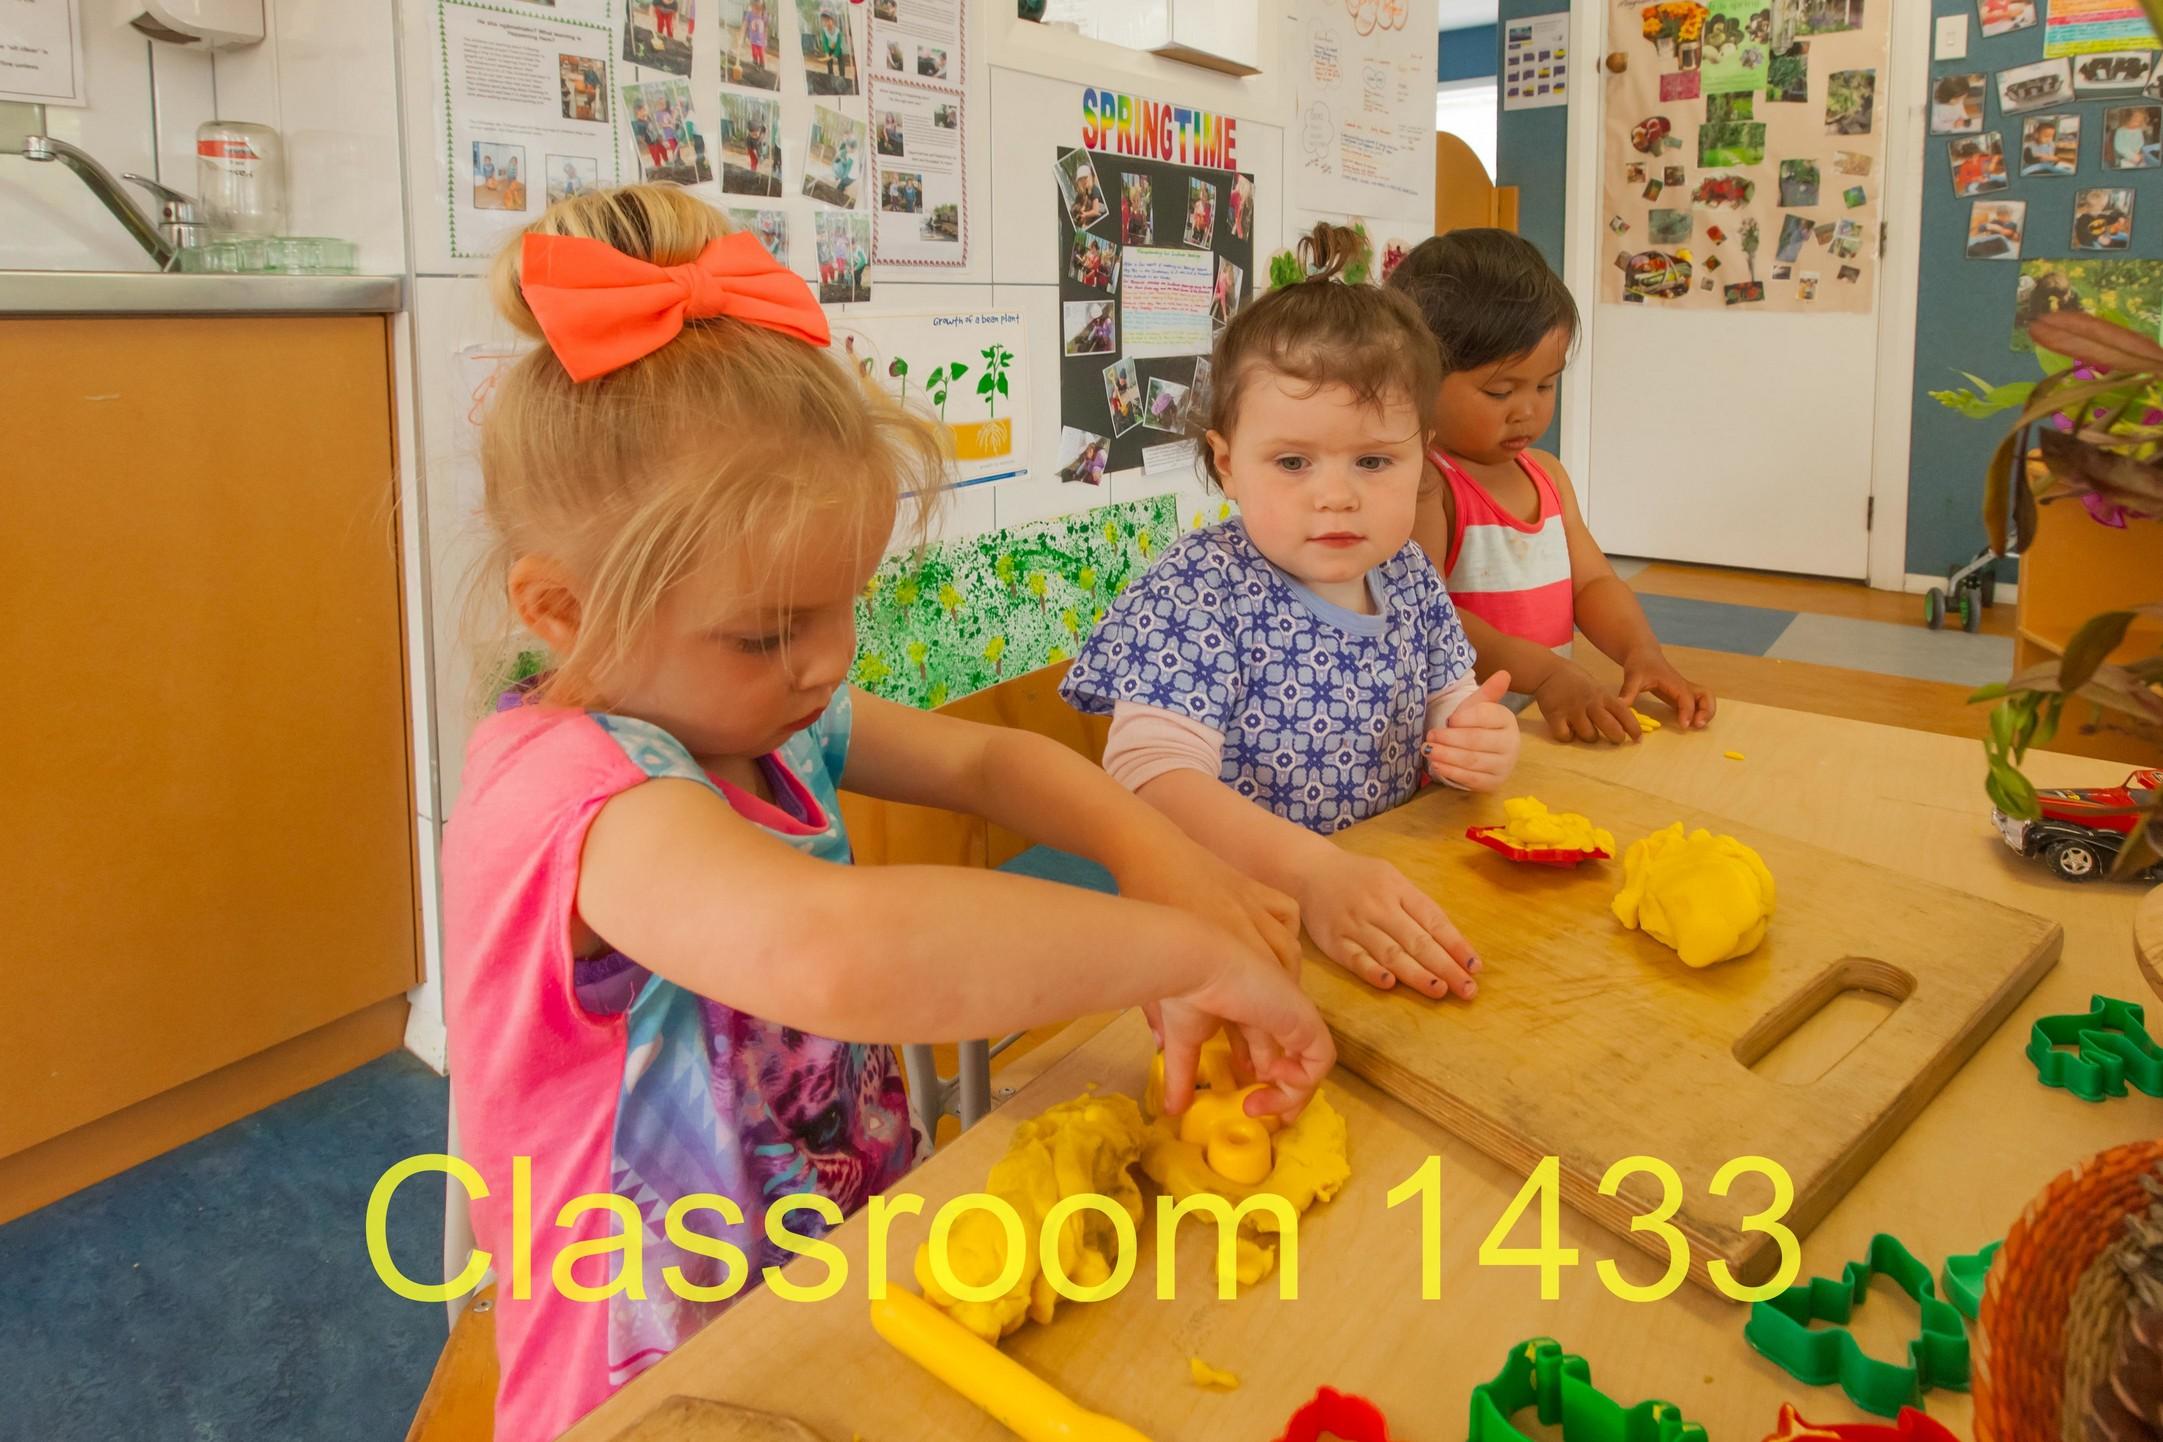 Classroom 1433